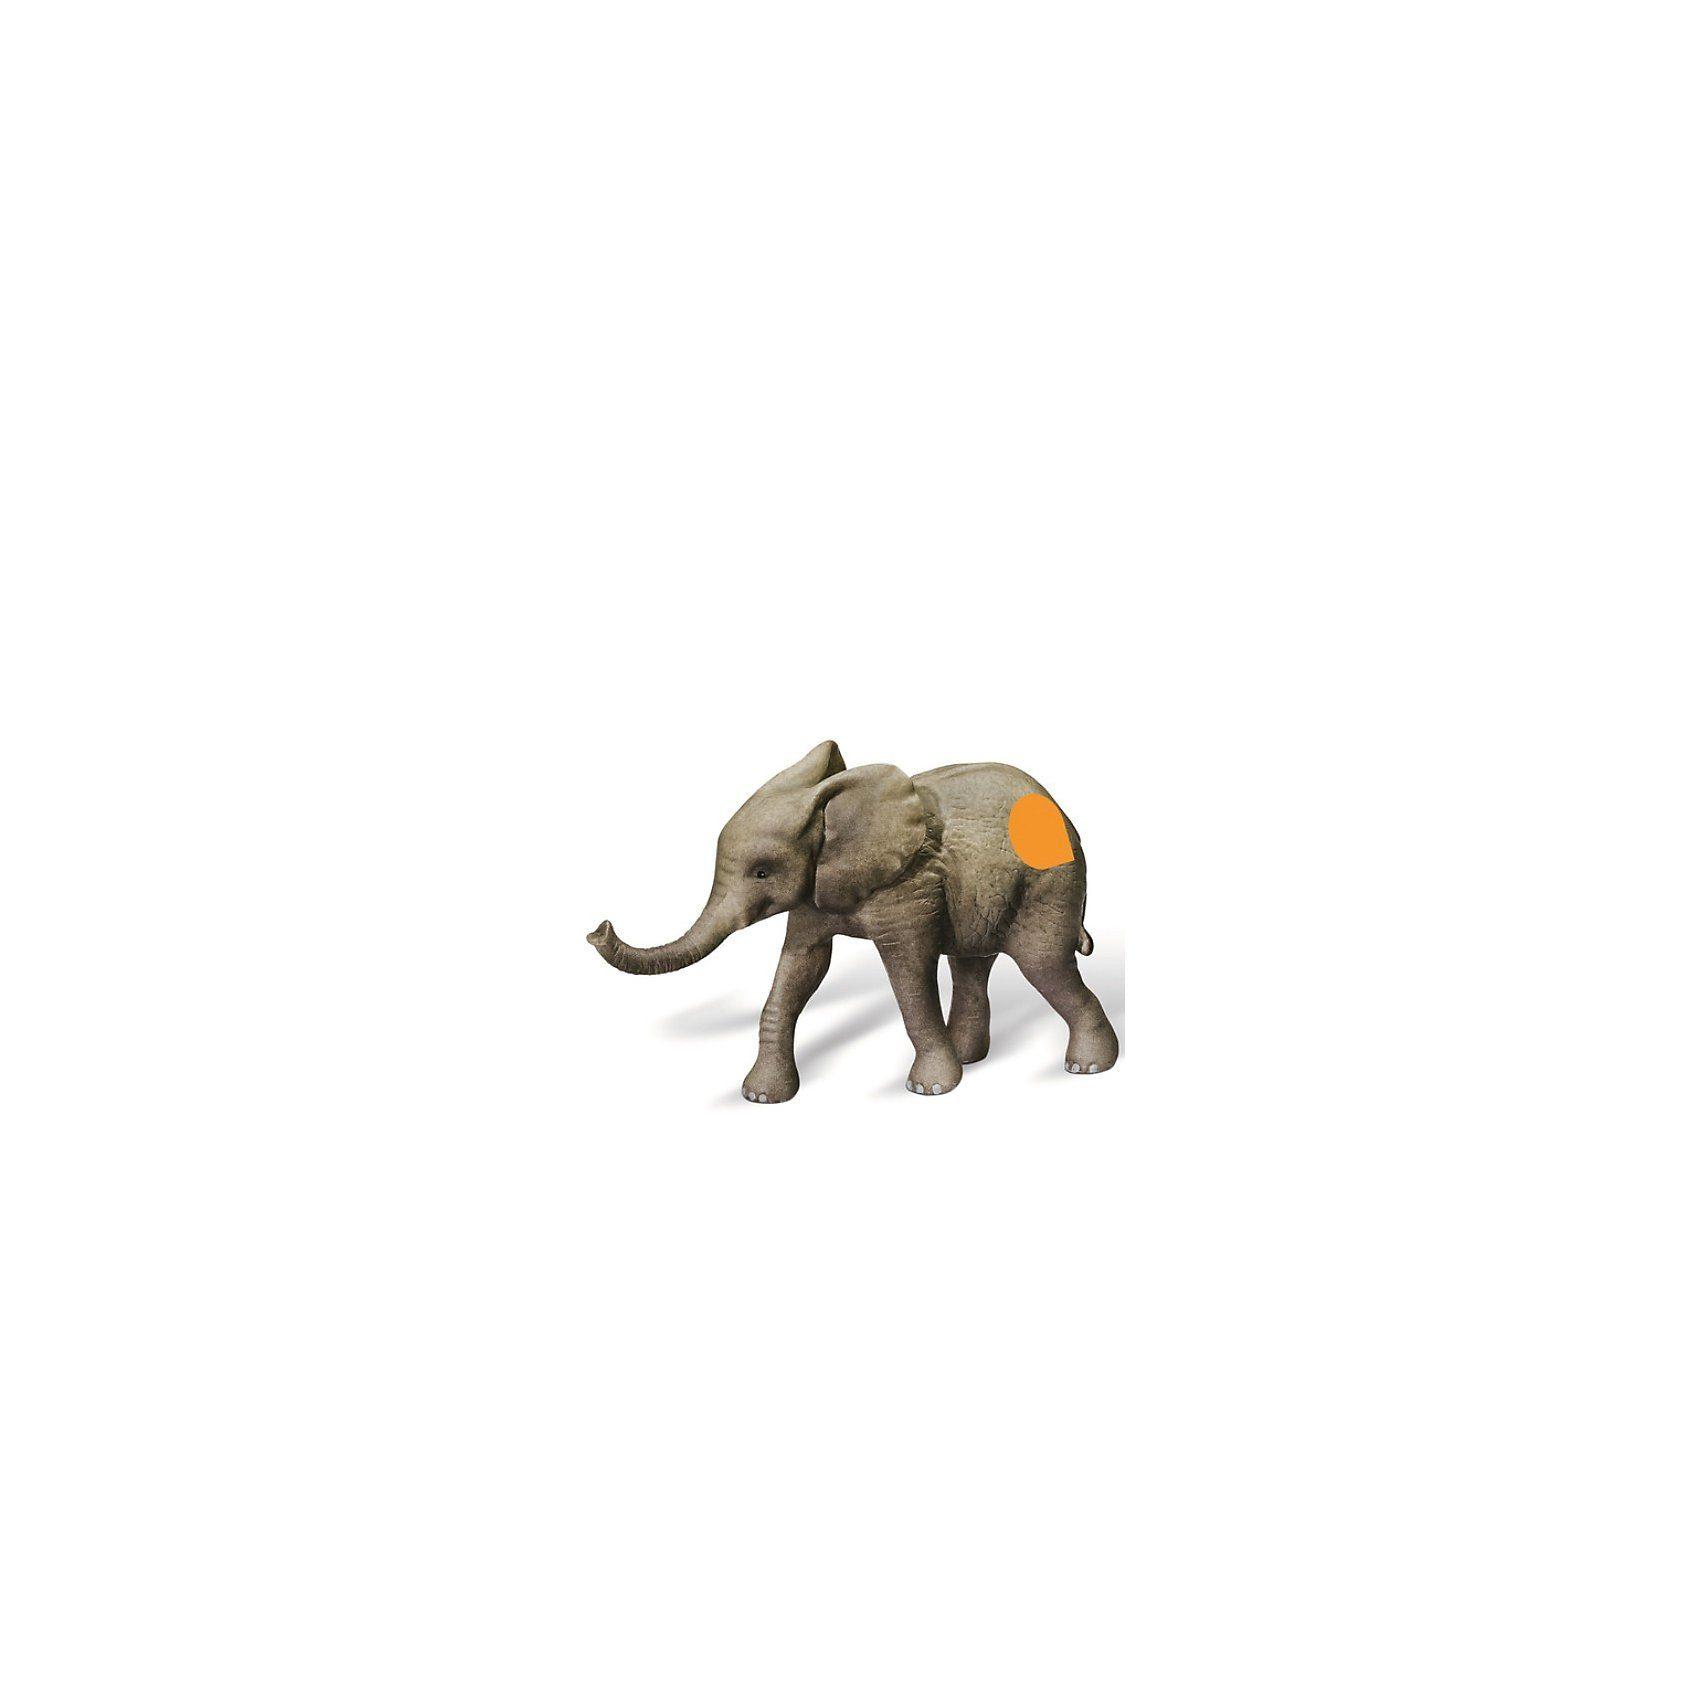 Ravensburger tiptoi® Spielfigur Afrikanisches Elefantenkalb